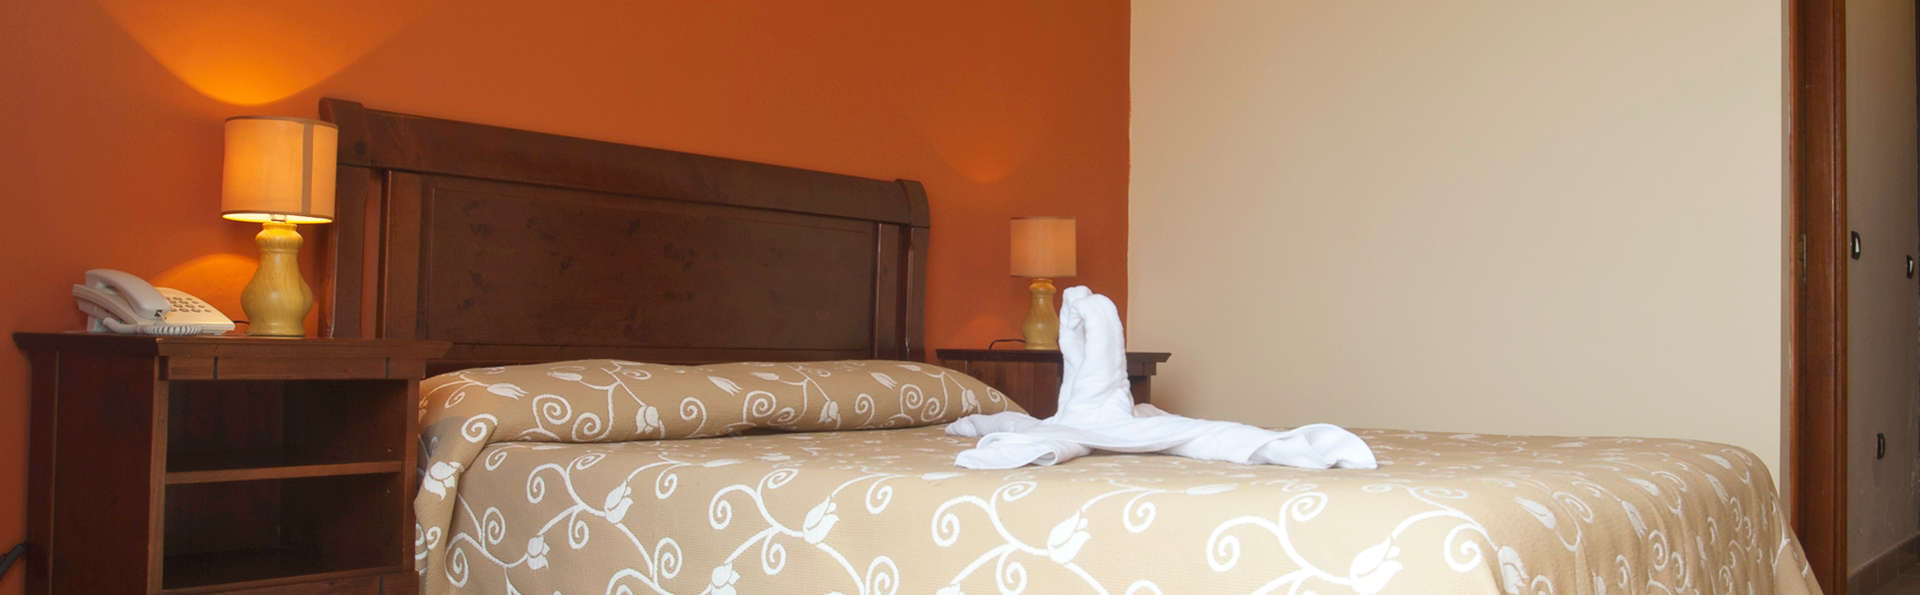 Hotel Villa El Mocanal - edit_room2.jpg